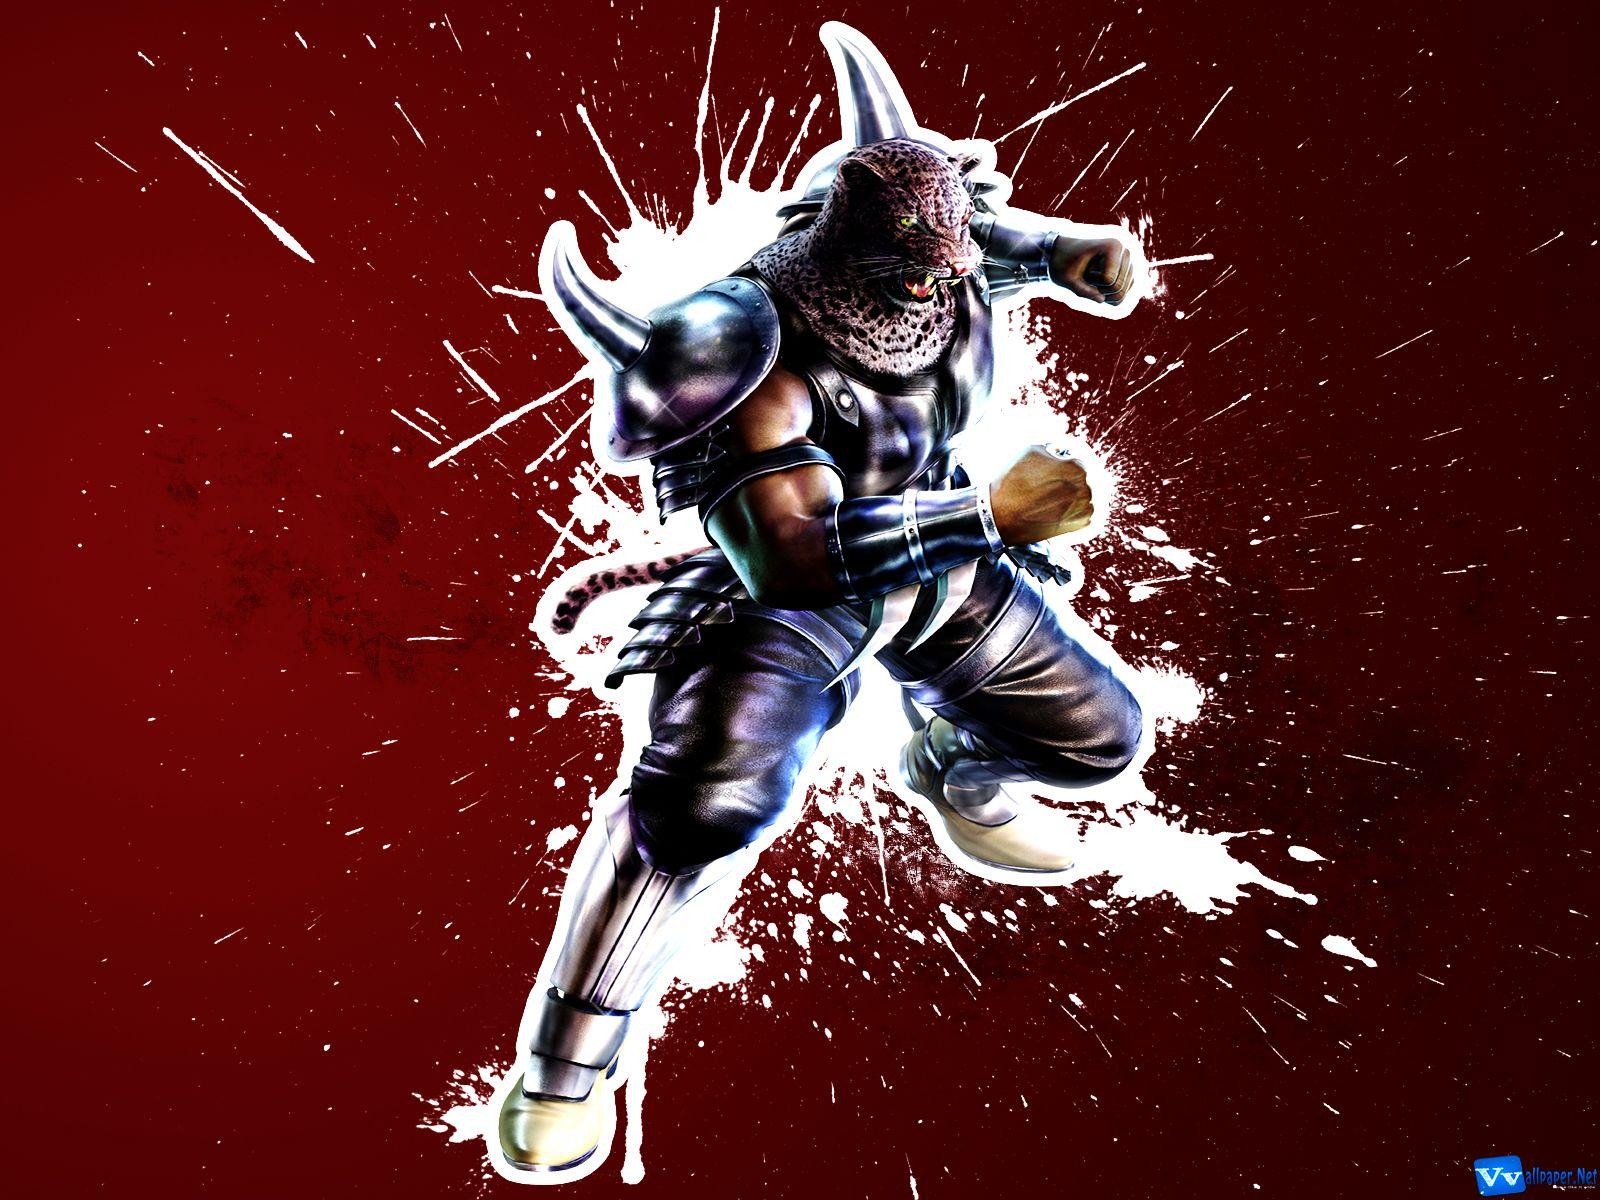 armor king tekken 7 king hd wallpaper